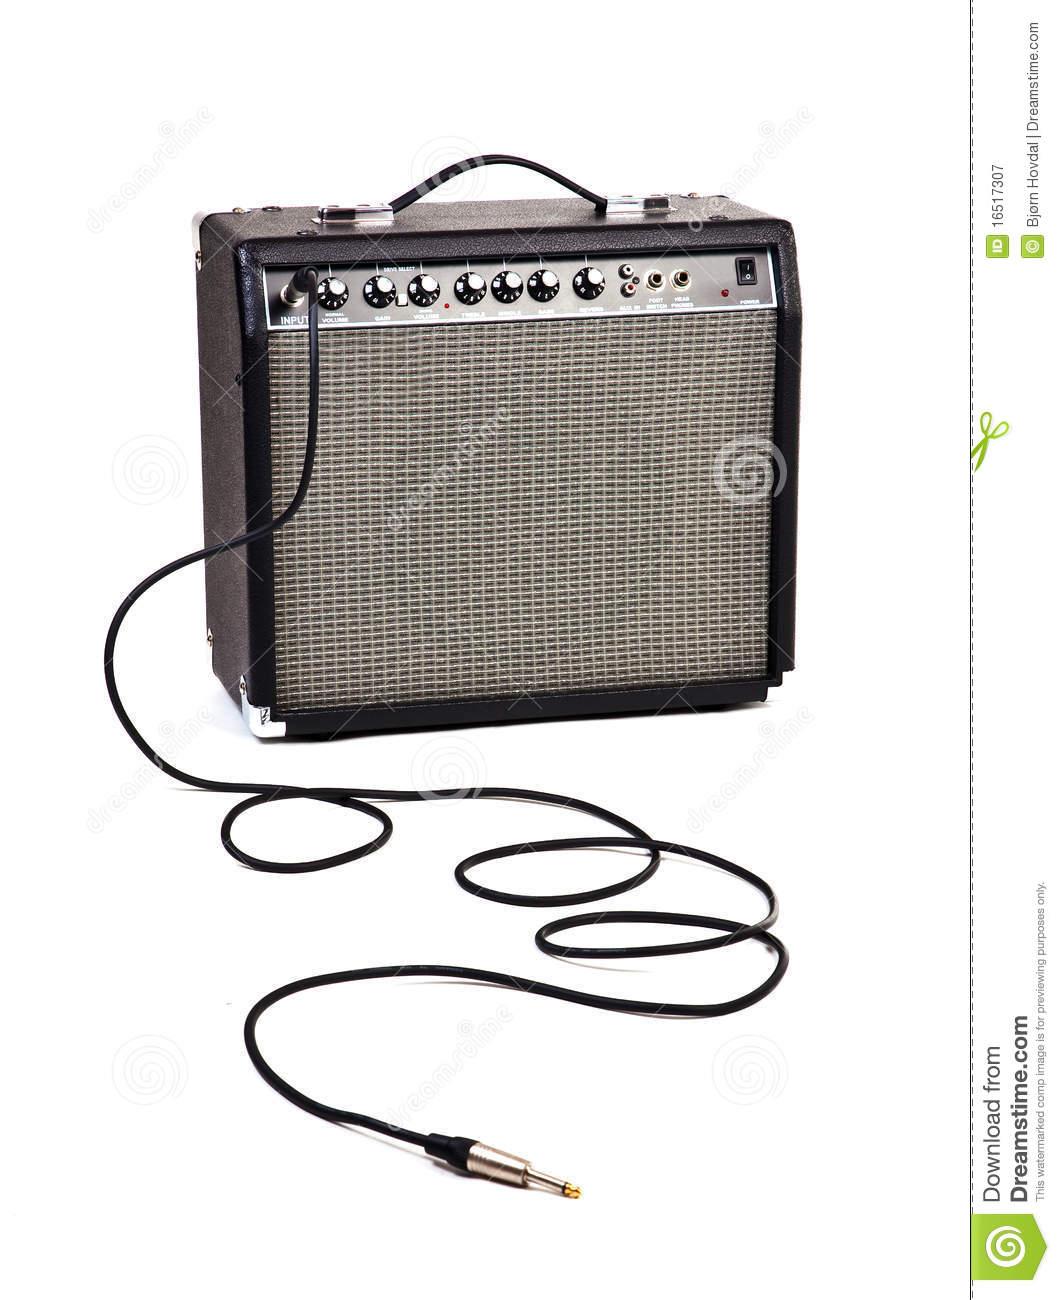 Guitar amp clipart.